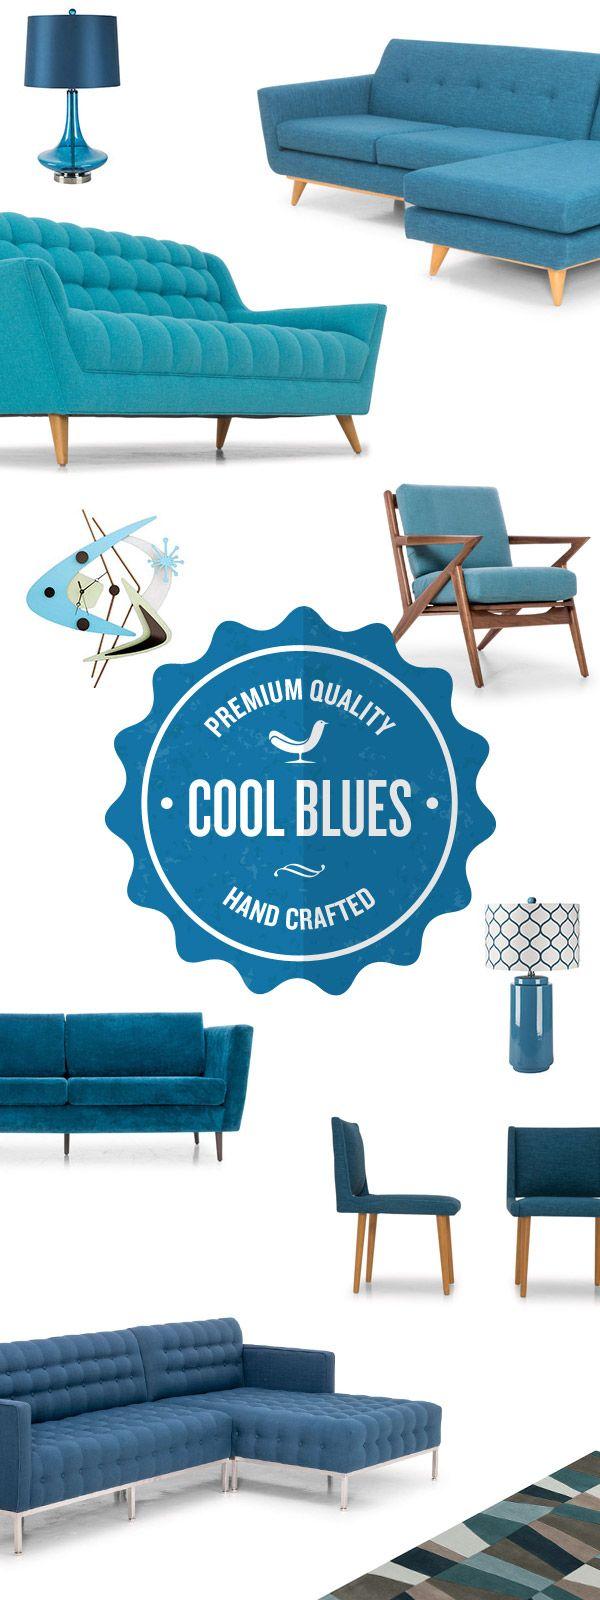 159 Best Brilliant Furniture Images On Pinterest